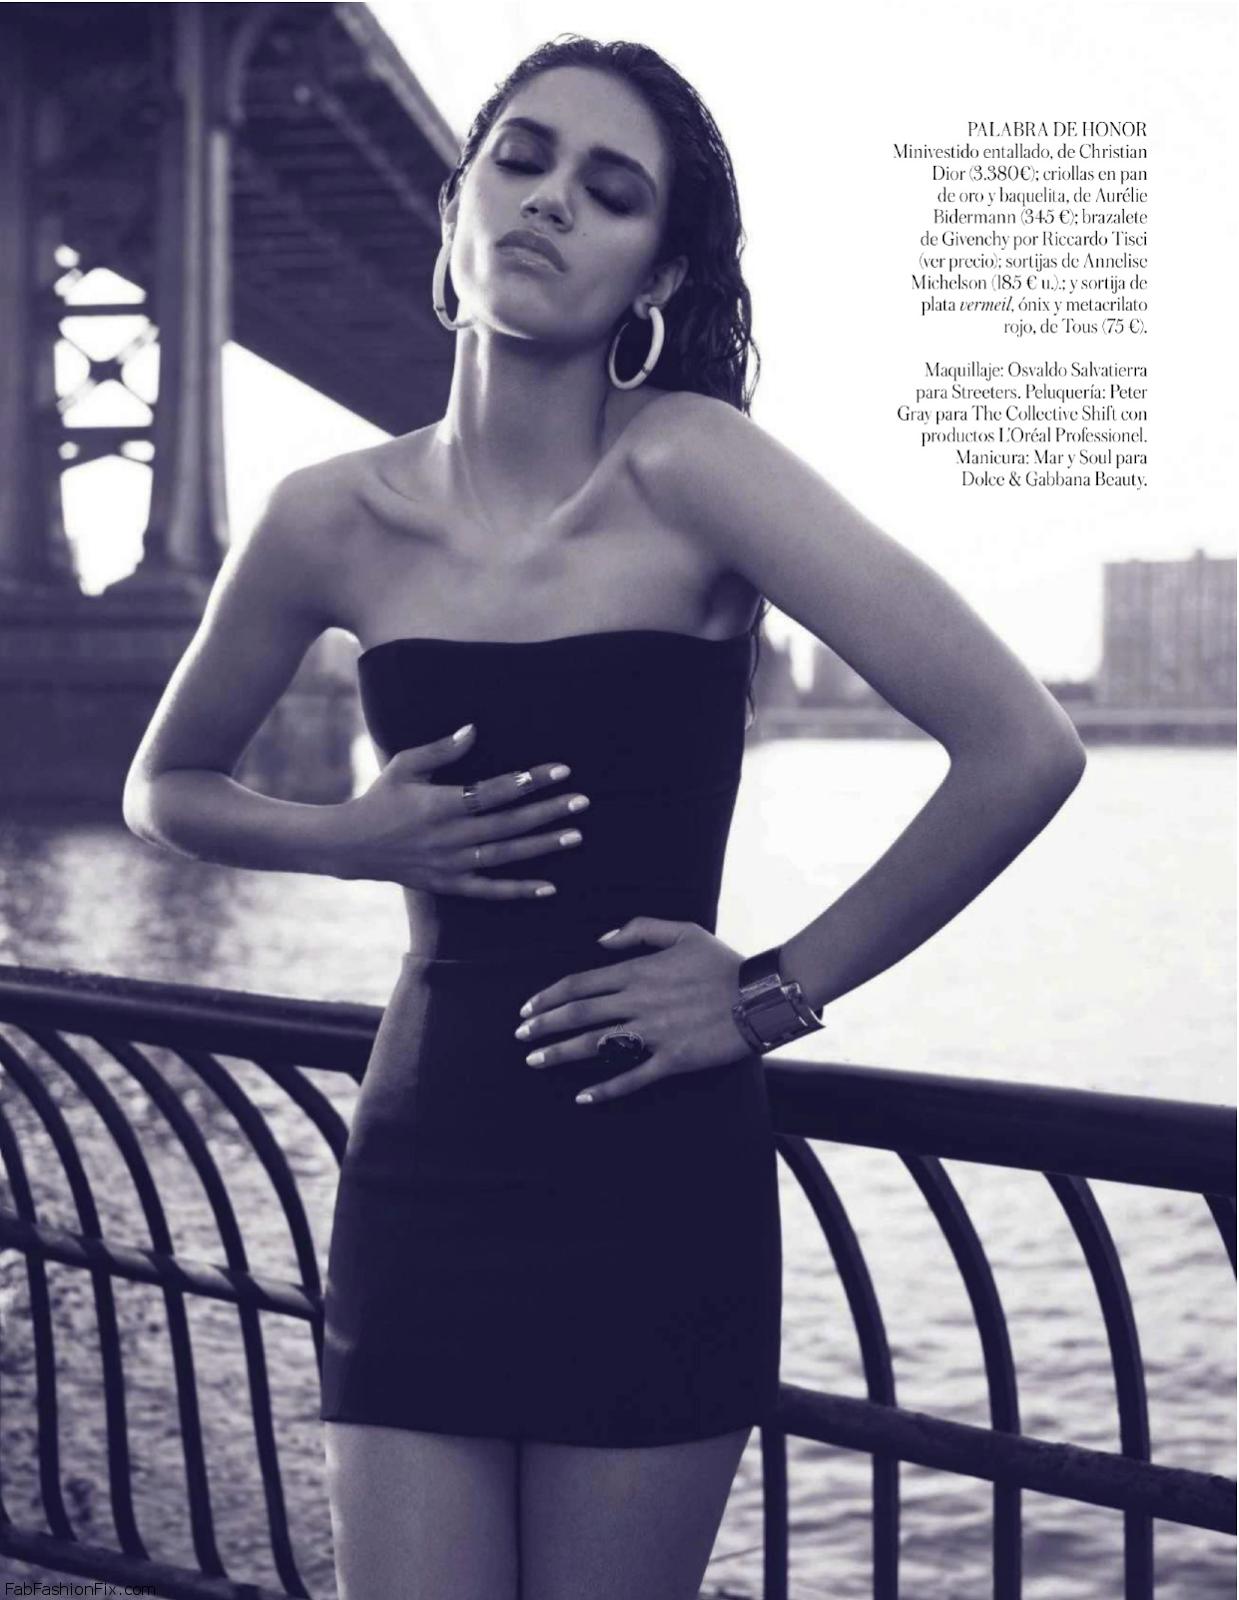 Vogue_Spain_-_Noviembre_2013 (dragged) 27